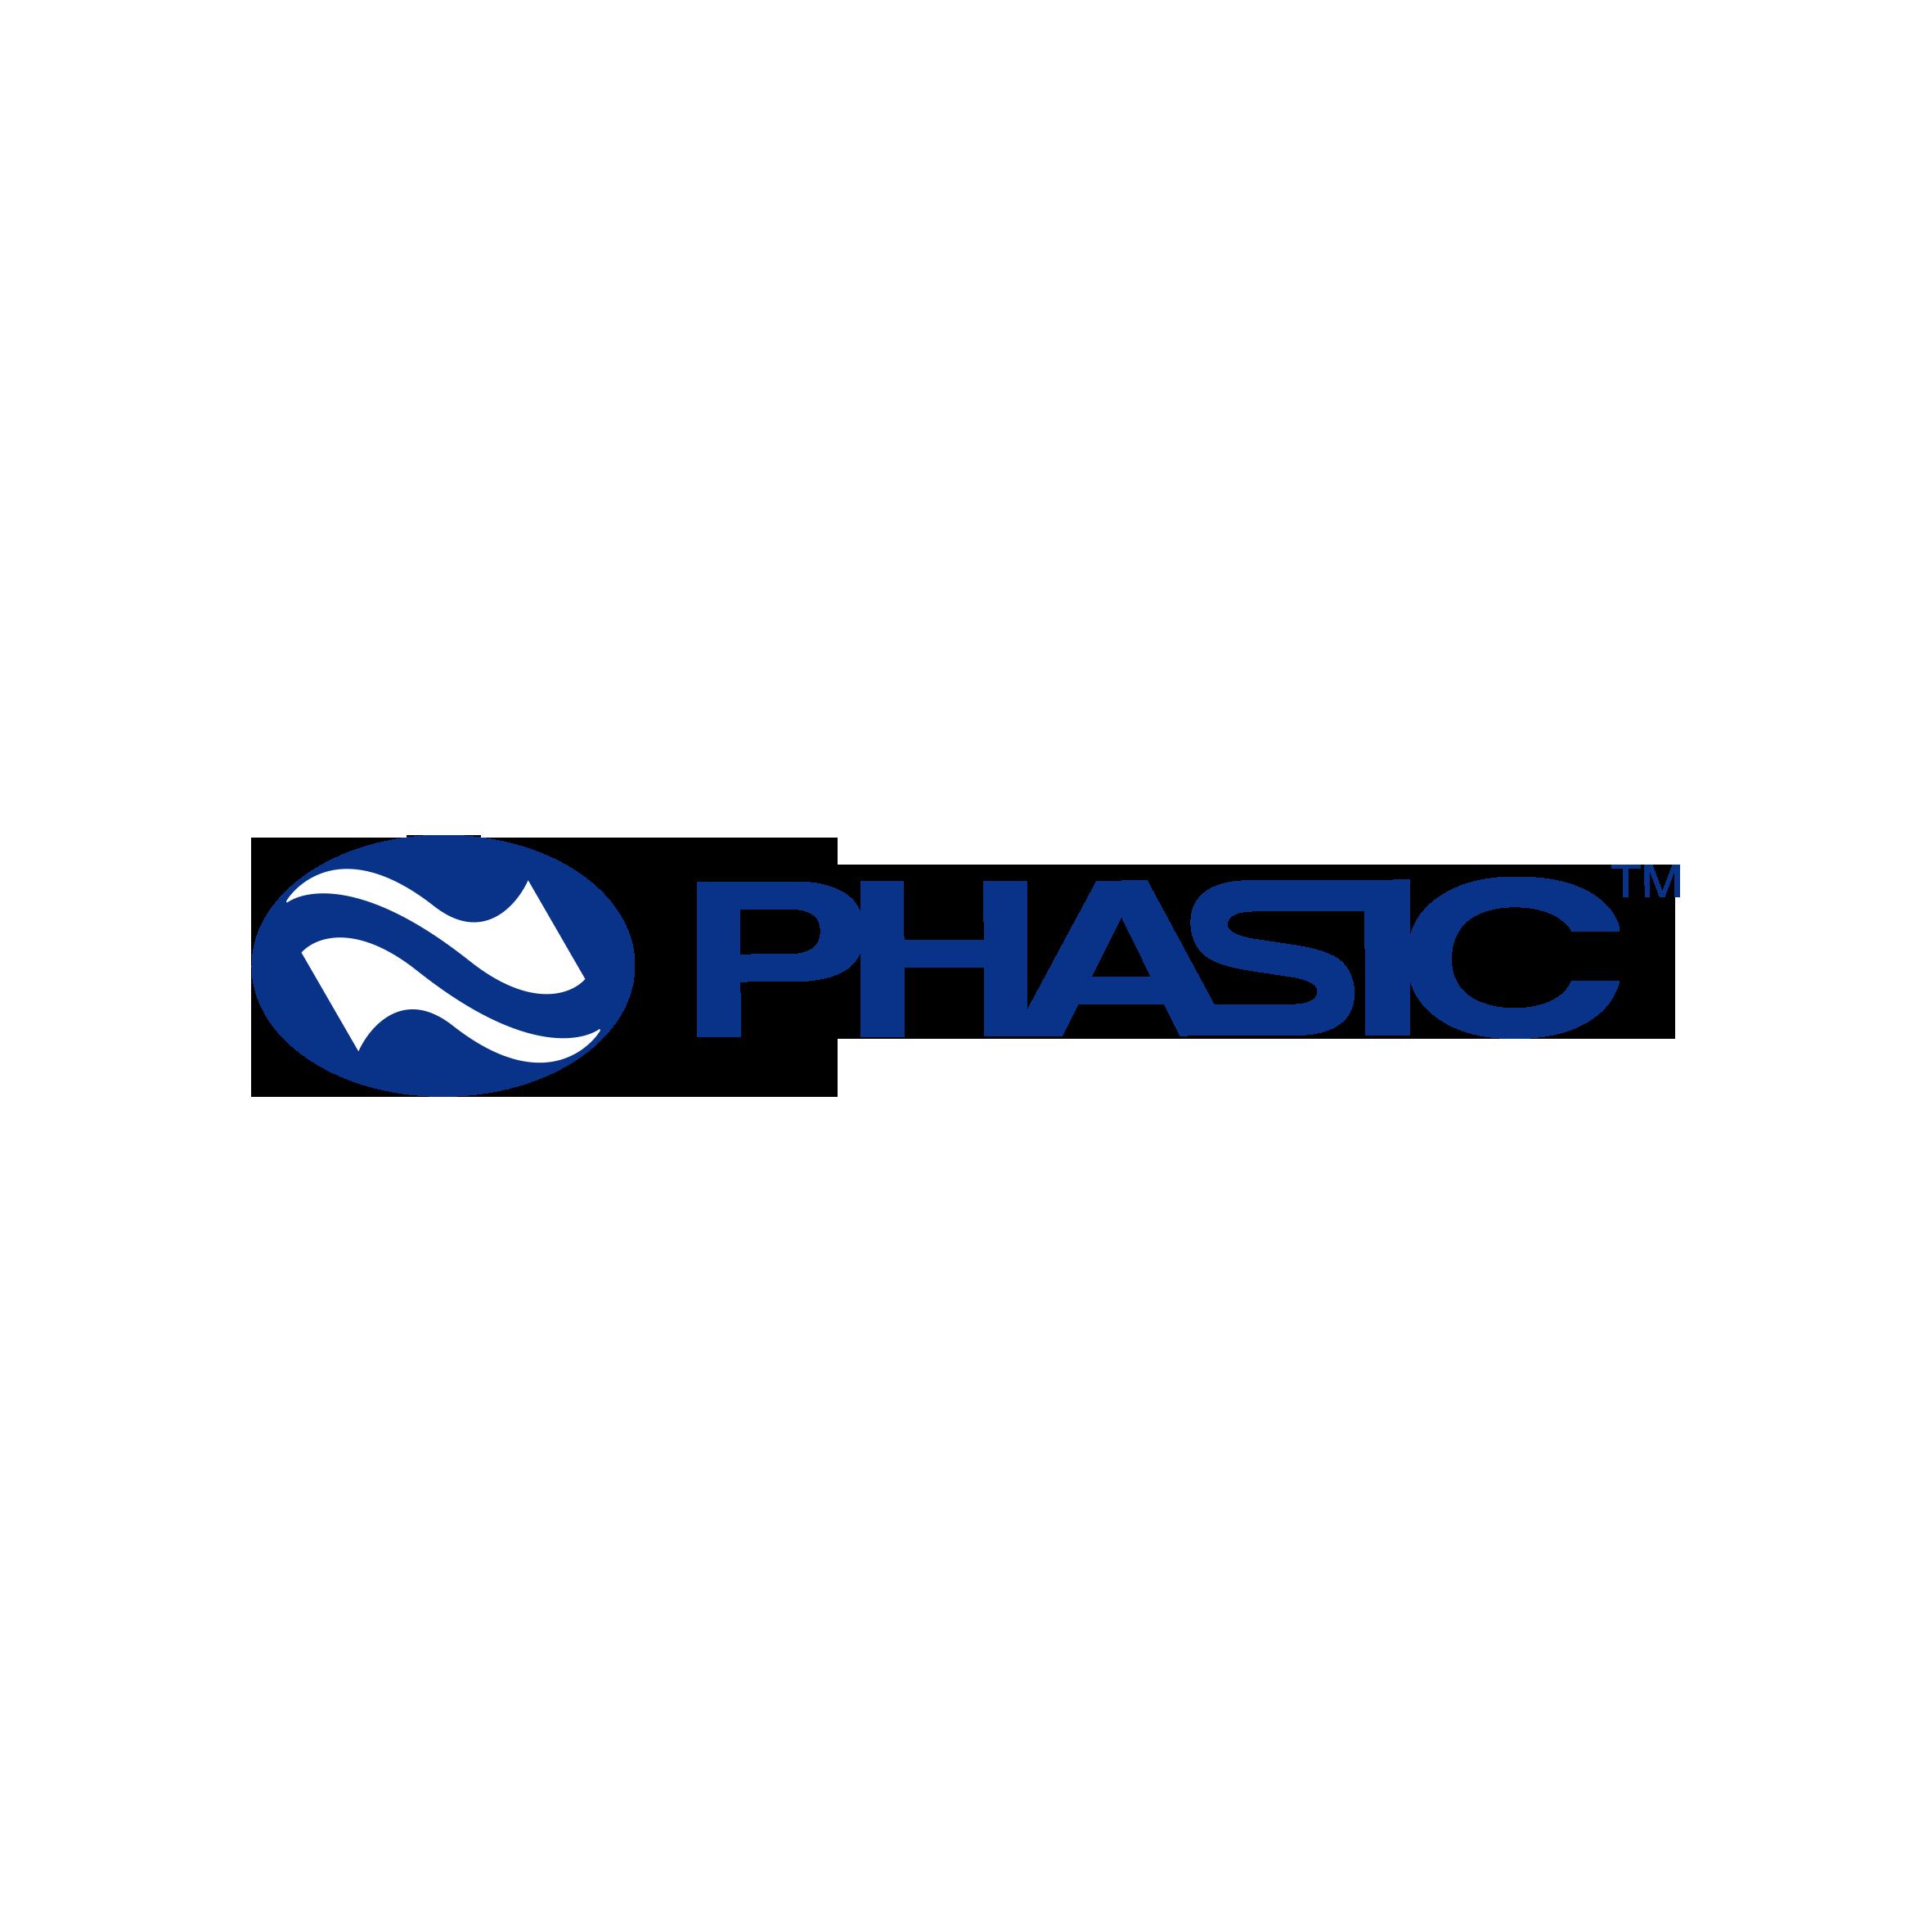 PHASIC CORPORATION